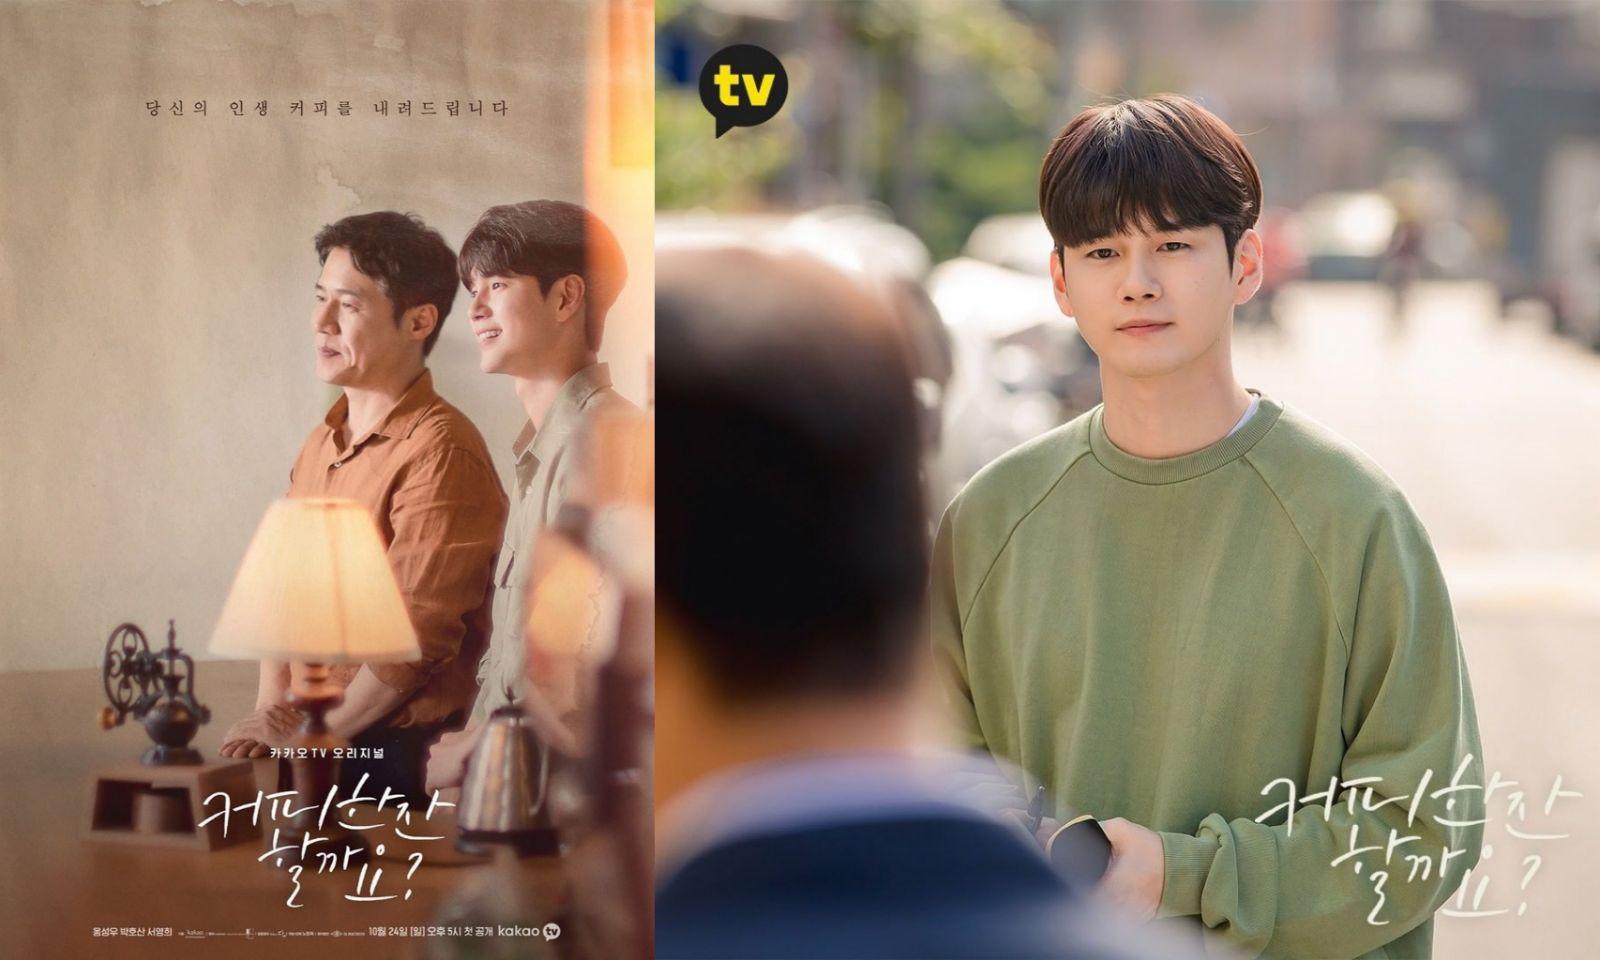 Drama Korea Oktober 2021 - Shall We Have a Cup of Cofffee?